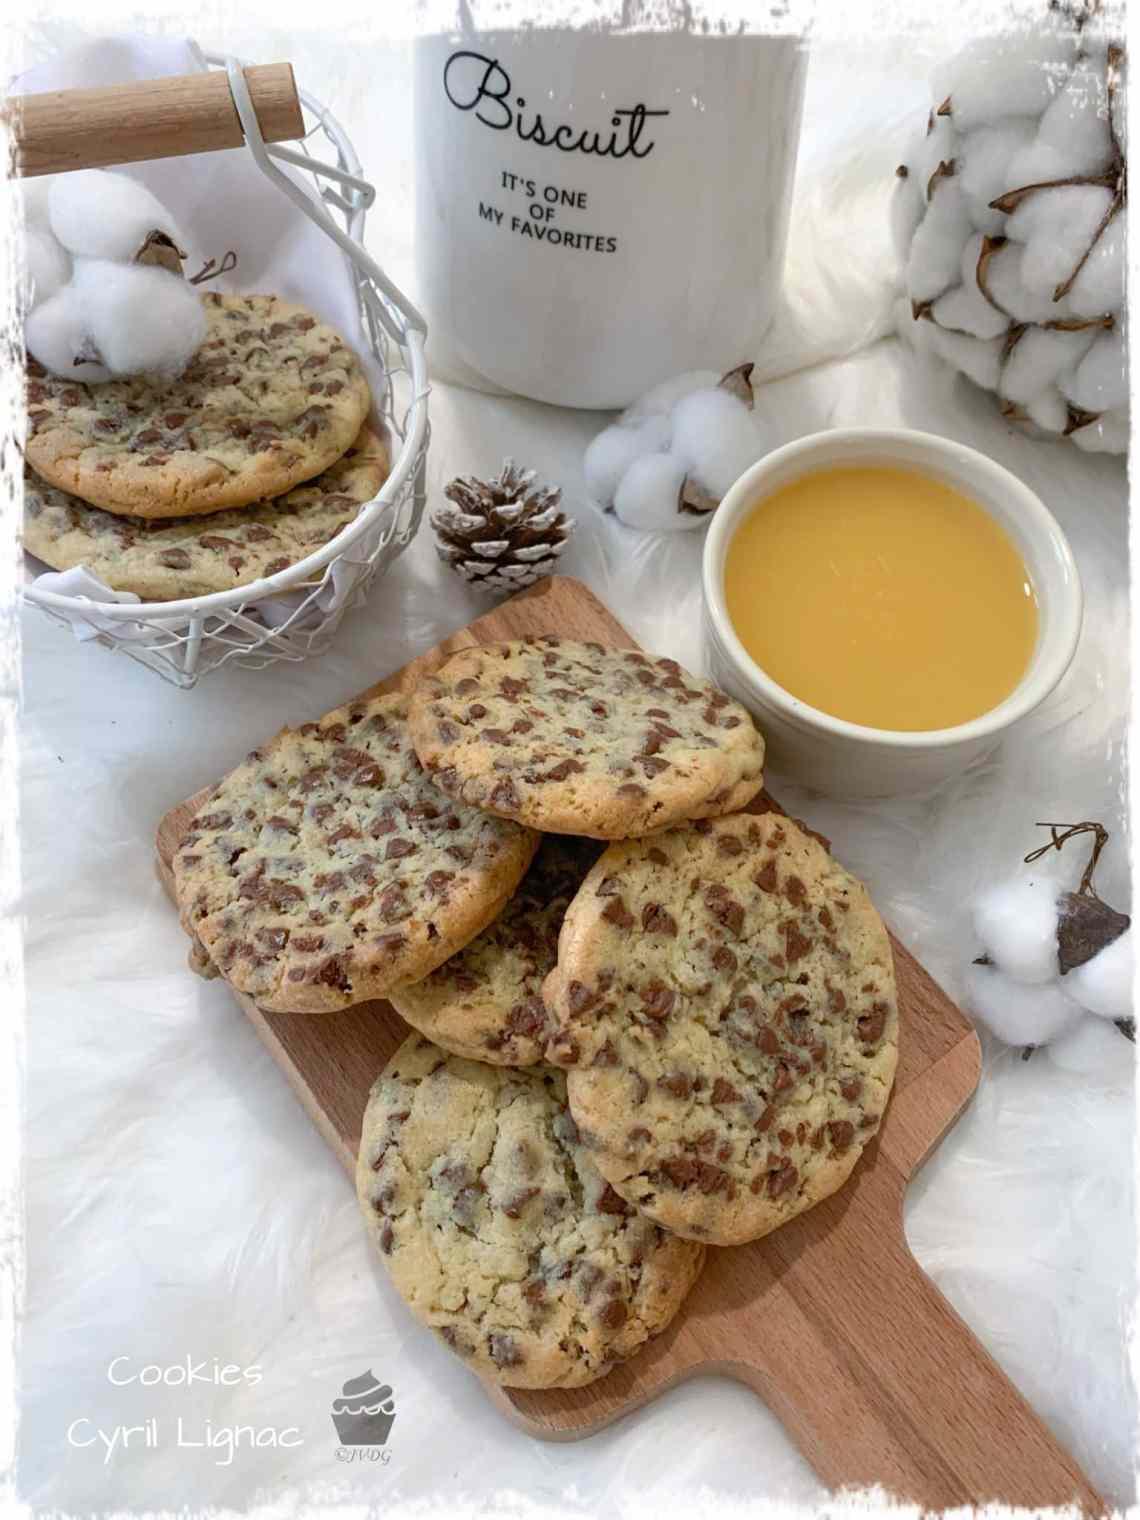 Cyril Lignac Recette Cookies : cyril, lignac, recette, cookies, Cookies, Cyril, Lignac, Gourmandises